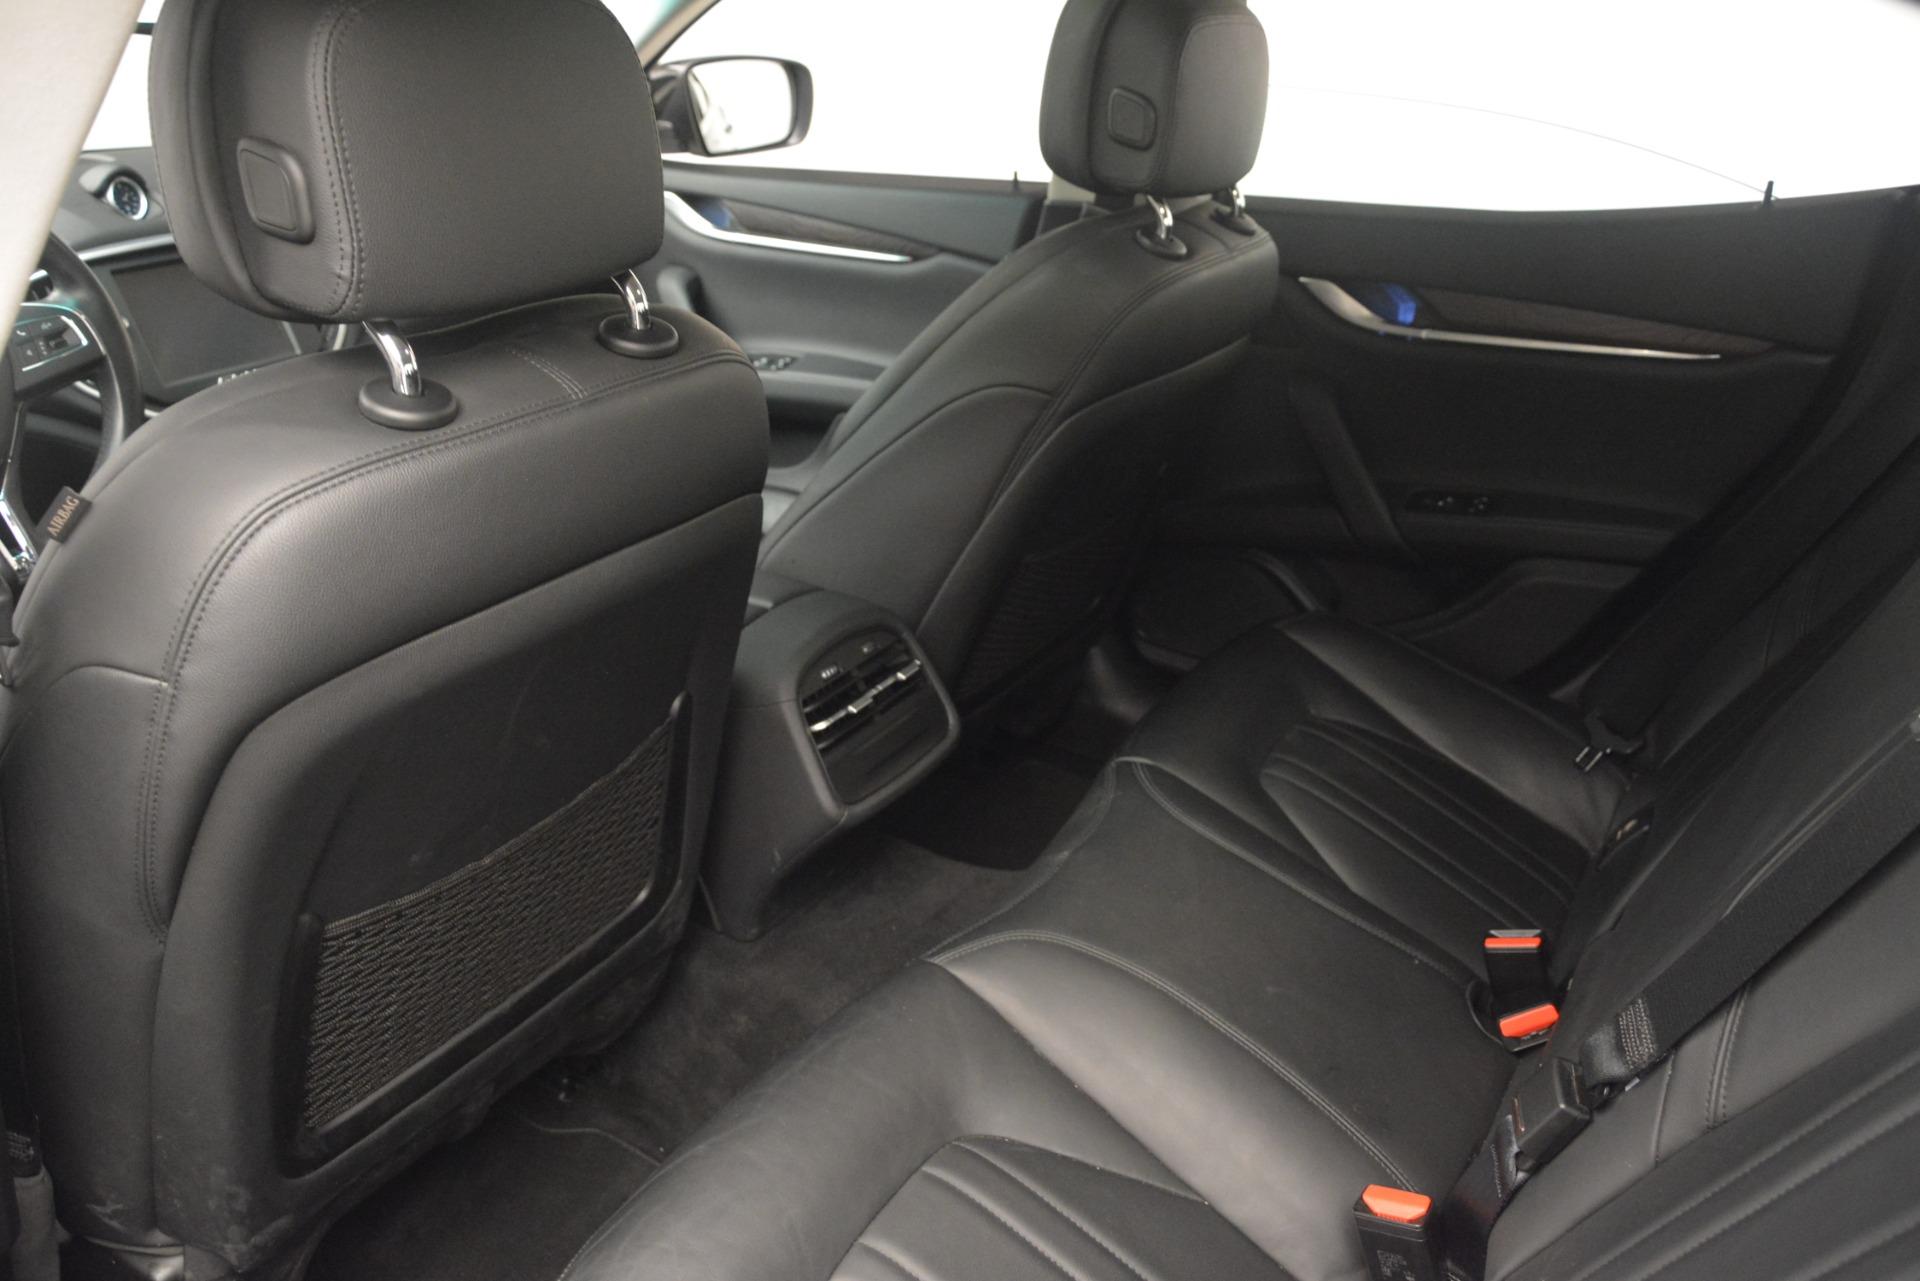 Used 2015 Maserati Ghibli S Q4 For Sale In Greenwich, CT 3102_p24